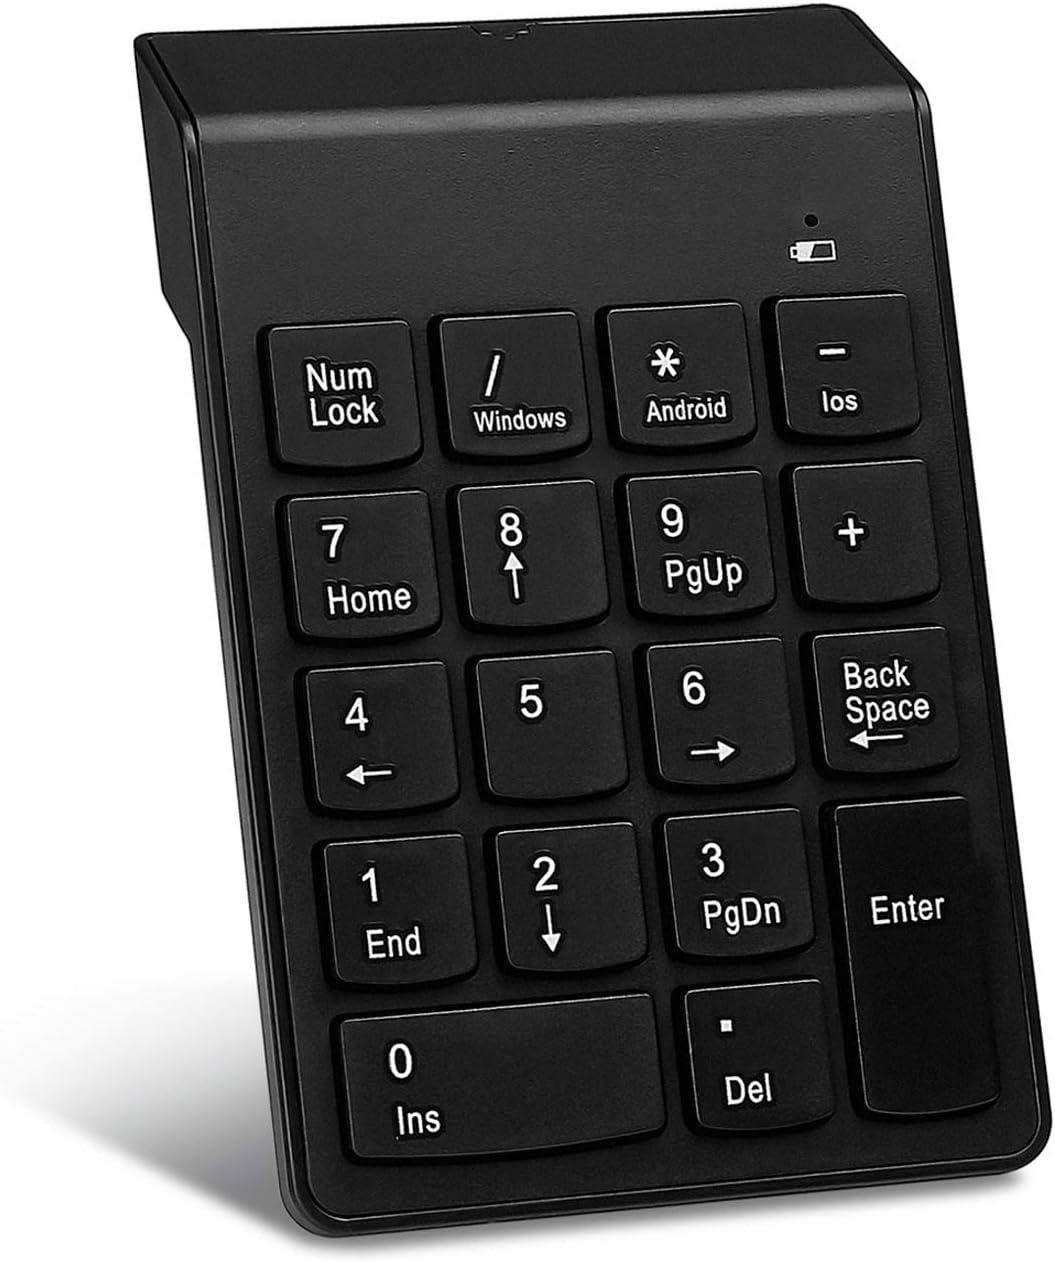 Bluetooth Numeric Keypad Cimetech Wireless Slim 18 Keys Multi-Function Numeric Keypad Keyboard Extensions for Laptop/Desktop/PCs/Notebook